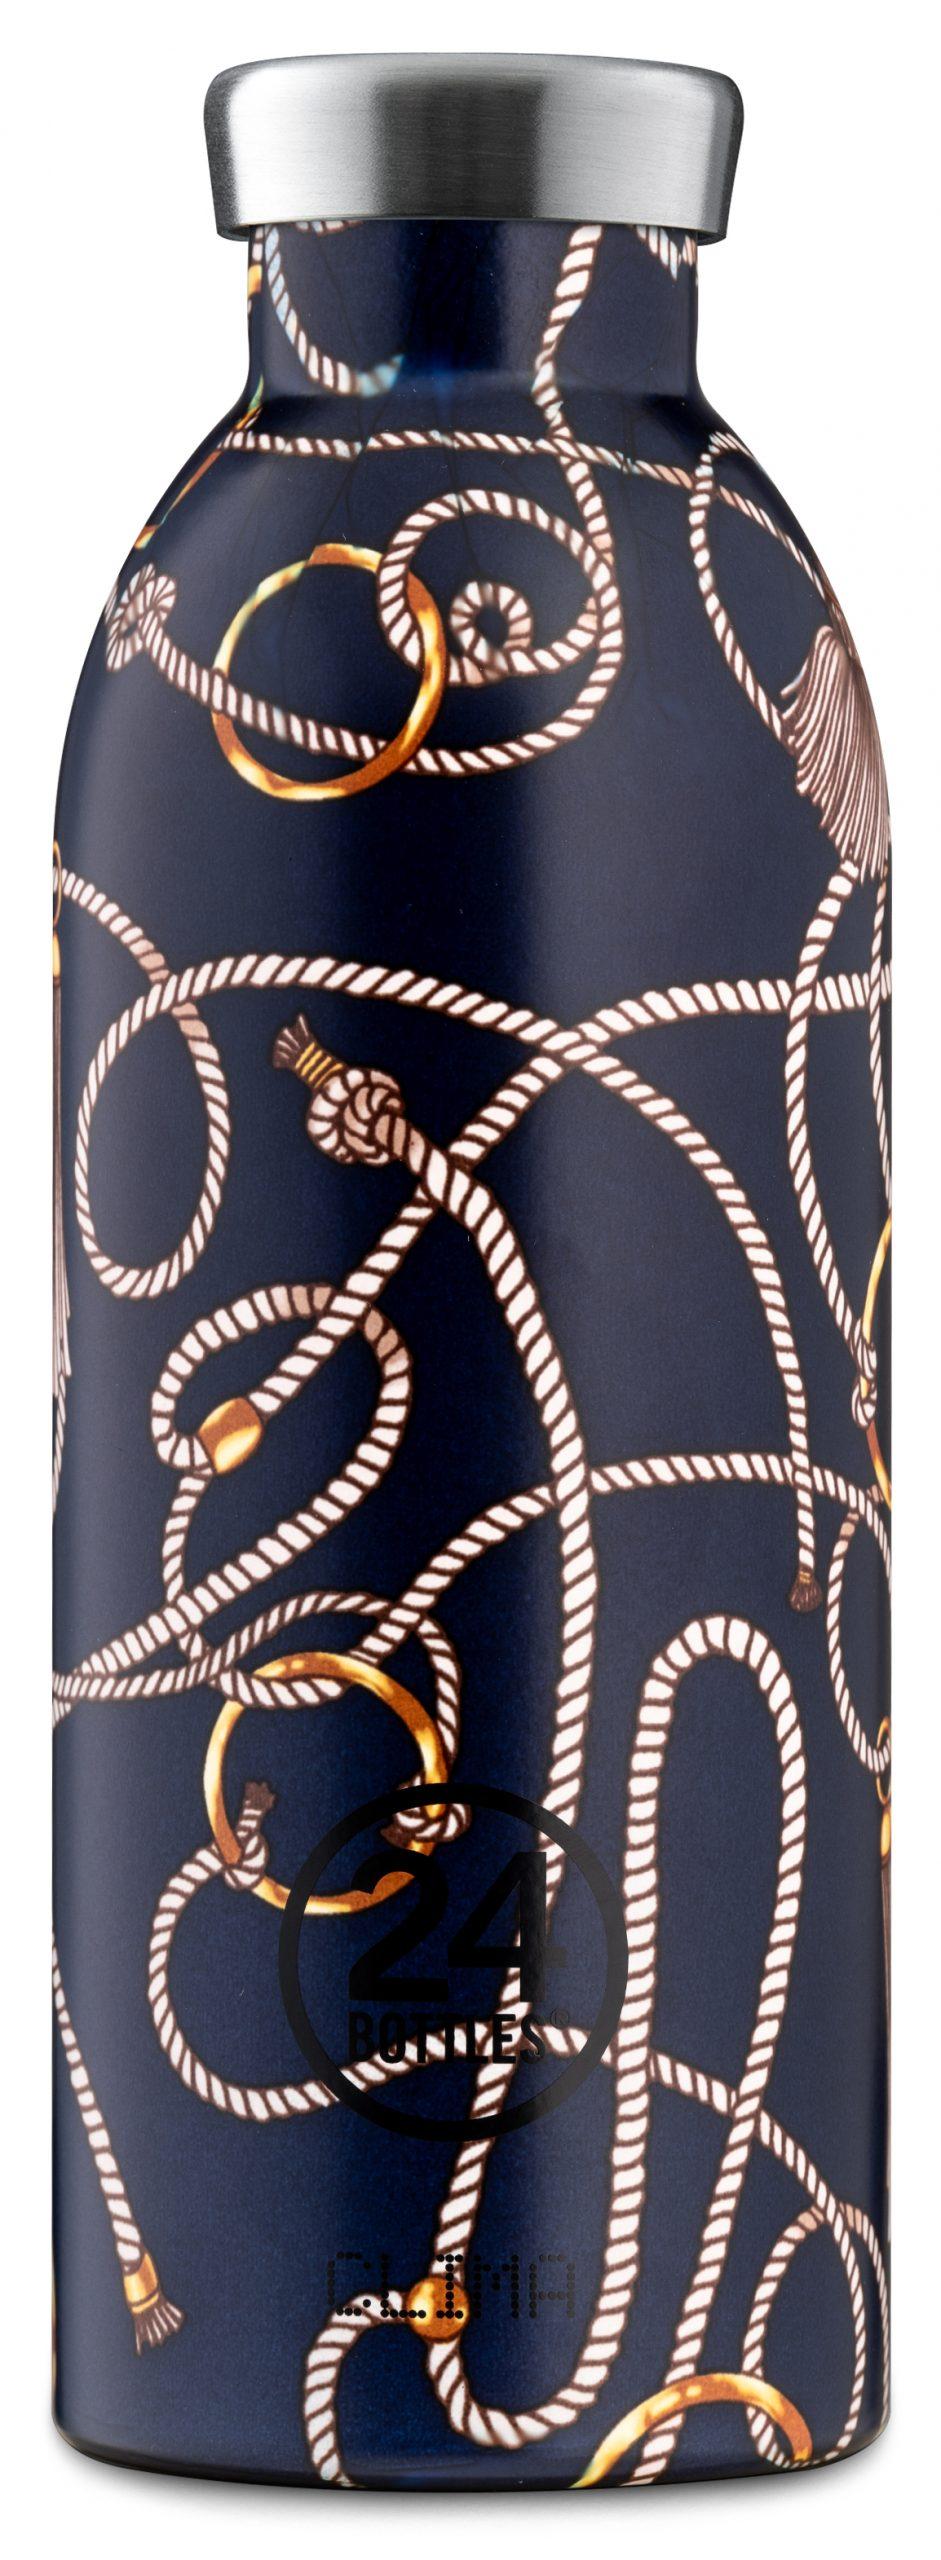 24bottles® Clima Bottle 500ml – Royal Mast